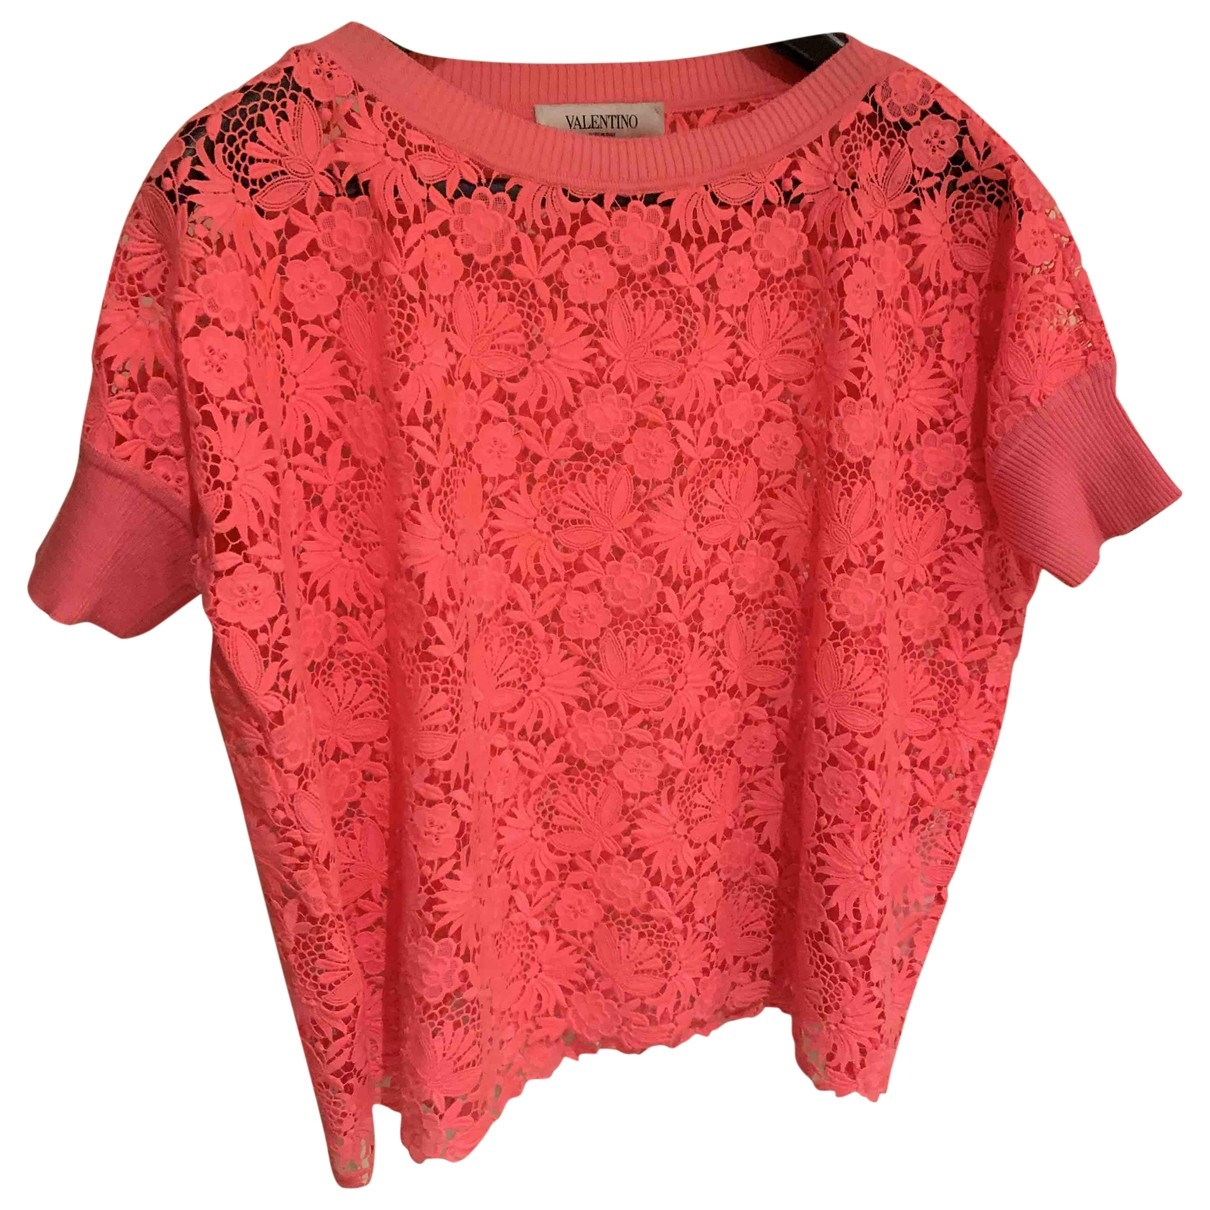 Valentino Garavani \N Pink Lace  top for Women M